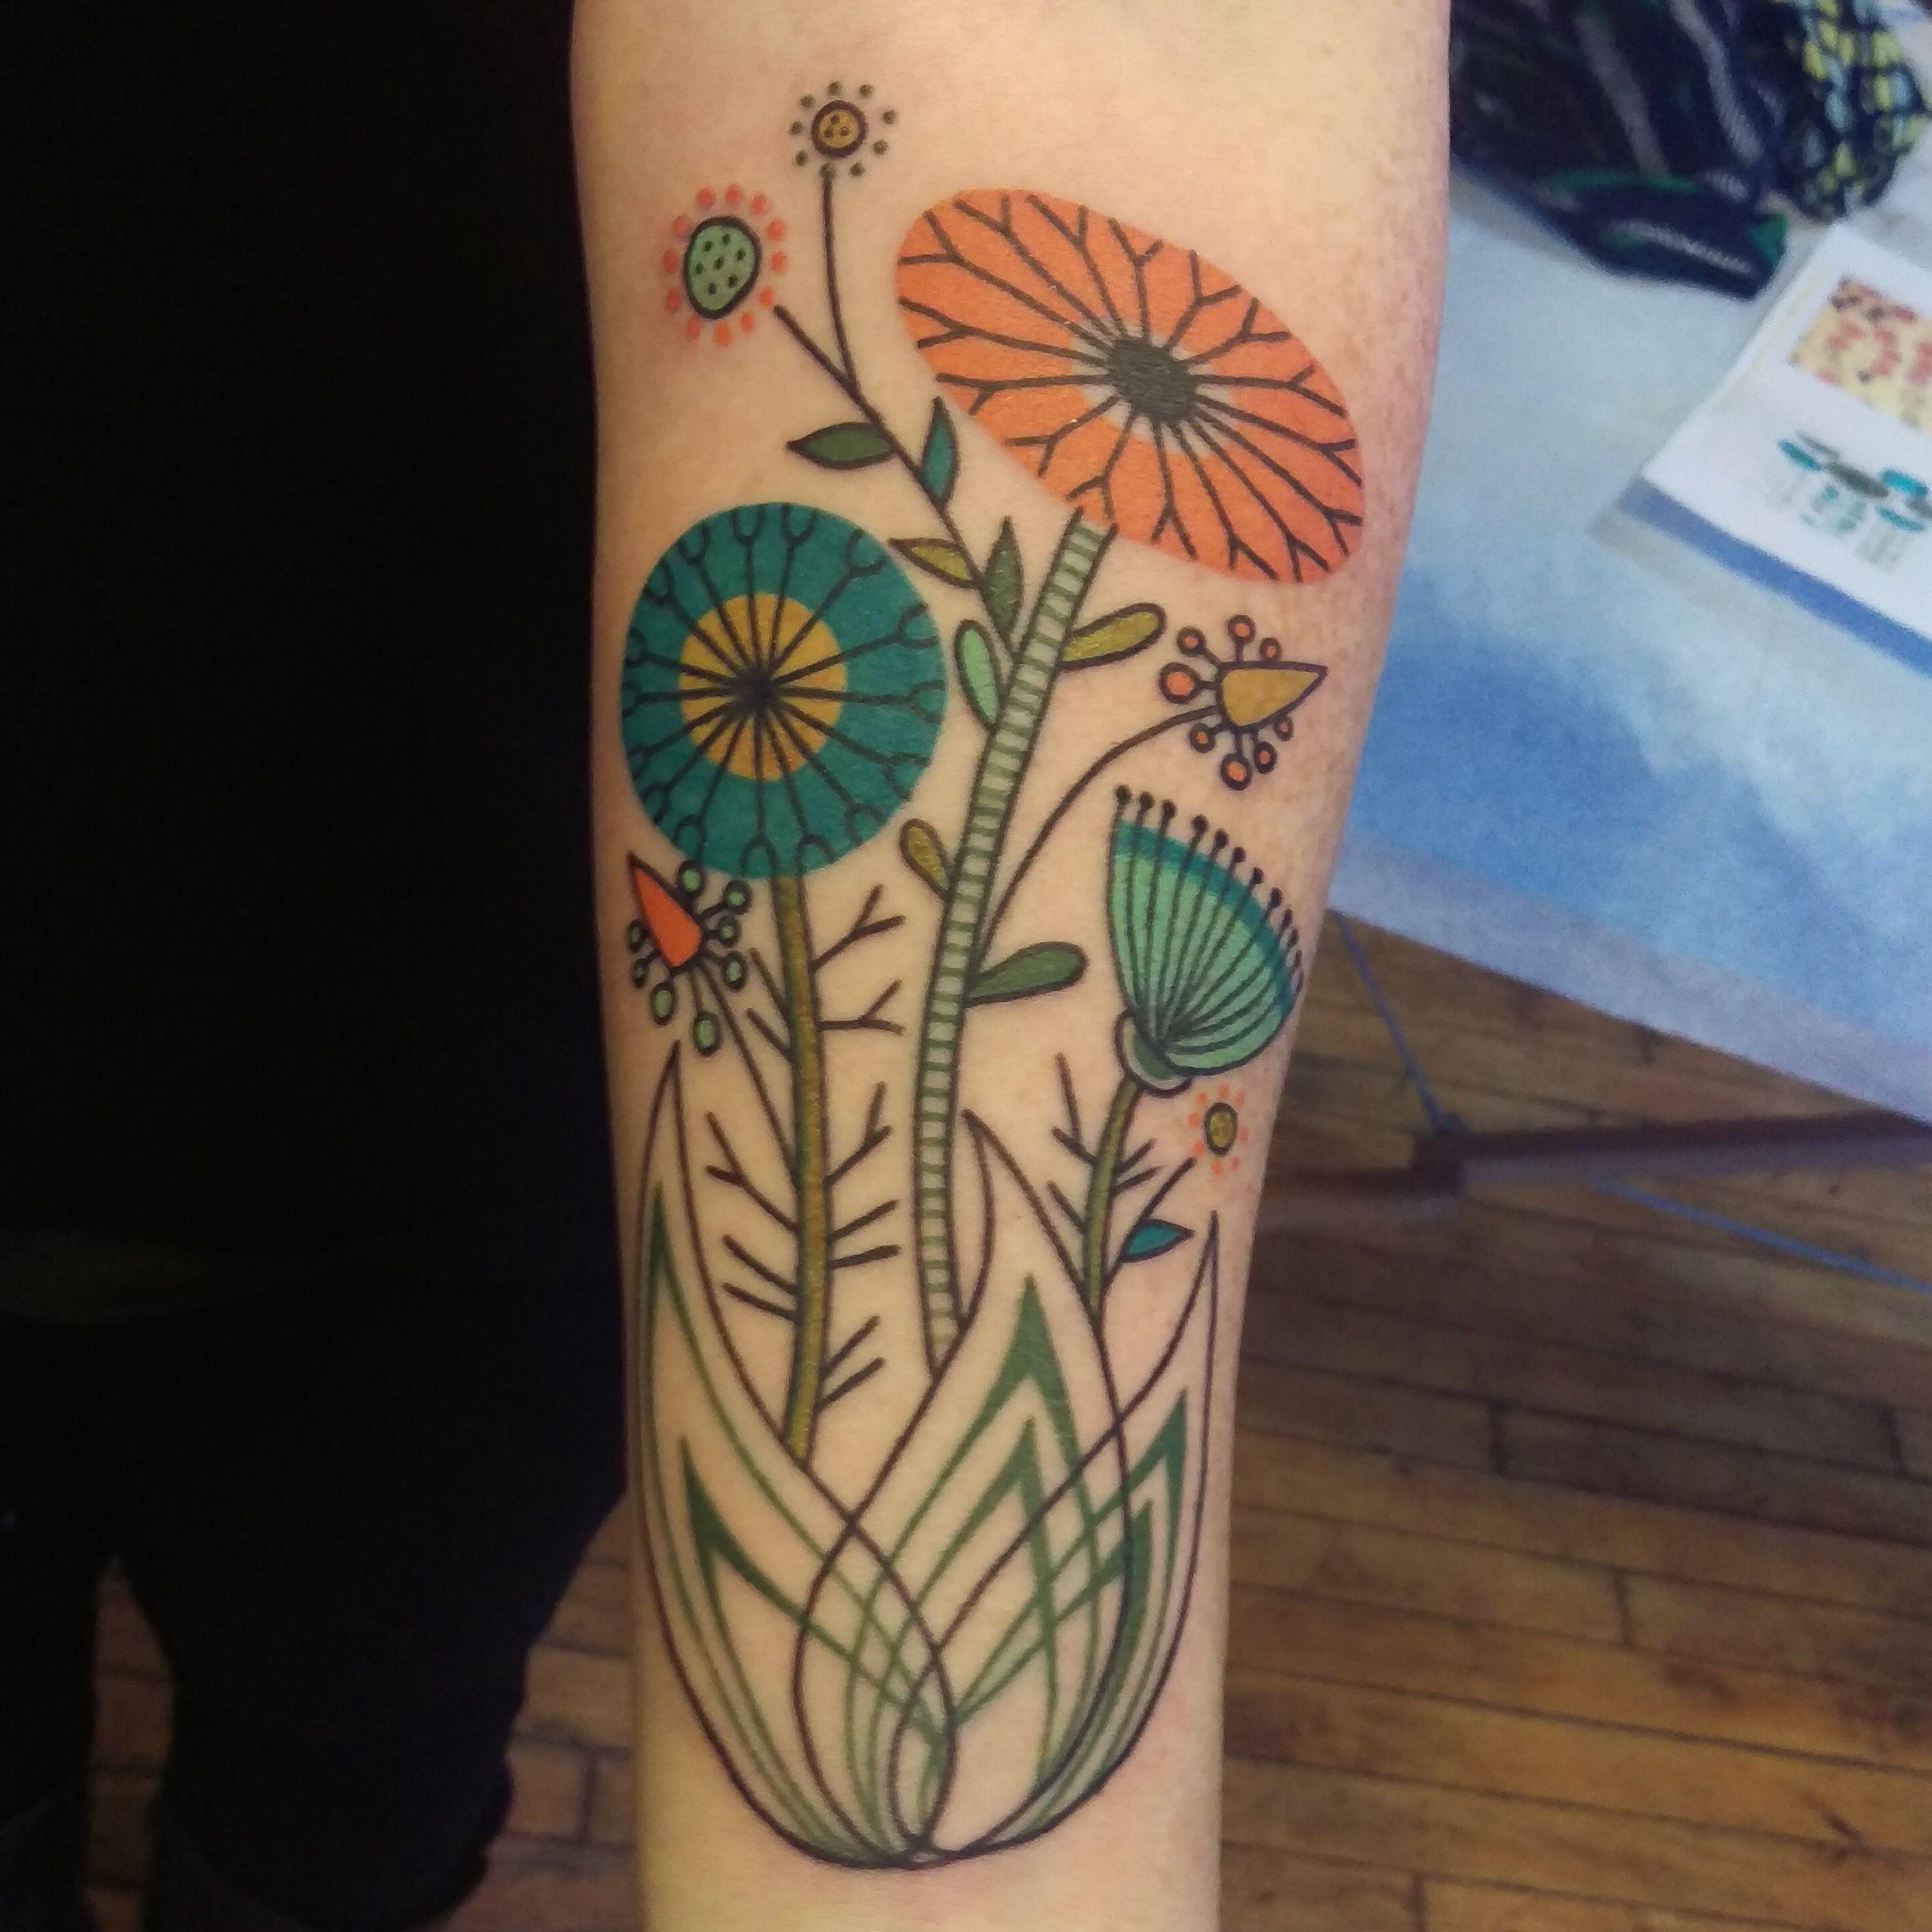 Henna tattoo charleston sc - The Resulting Tattoo By Jennifer Trok Mid Century Modern Inspired Floral